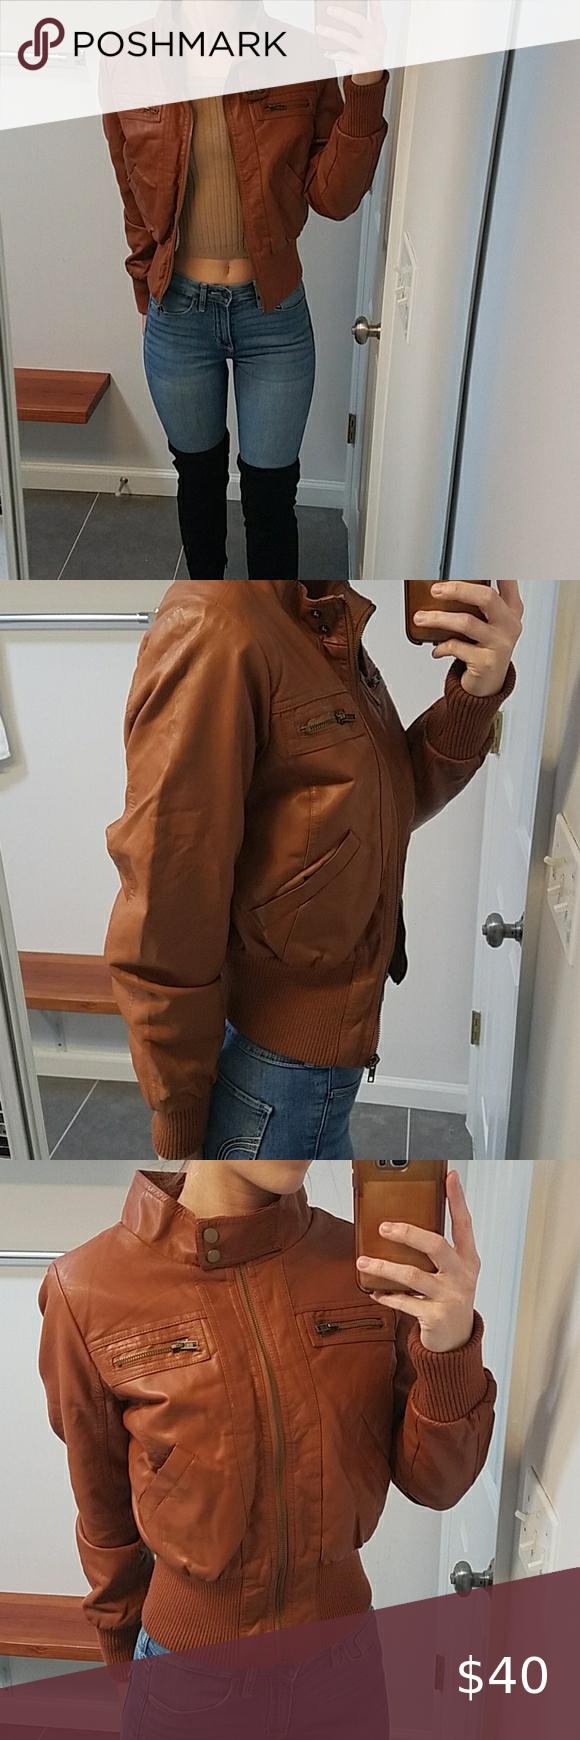 Nwot Faux Leather Cropped Jacket In 2021 Faux Leather Hoodie Maroon Leather Jacket Coats Jackets Women [ 1740 x 580 Pixel ]